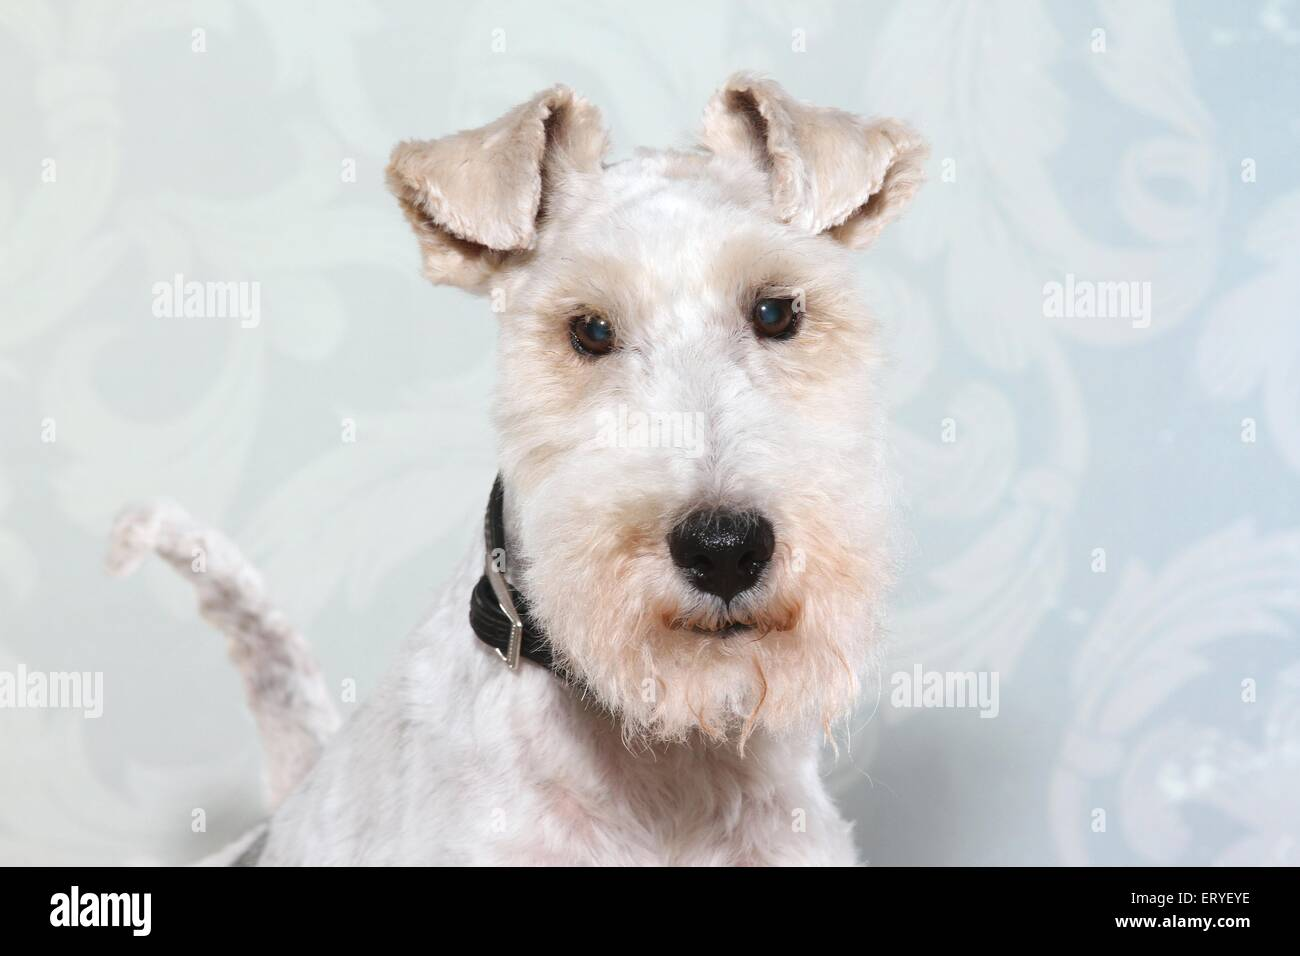 Fox Terrier Stock Photos & Fox Terrier Stock Images - Alamy